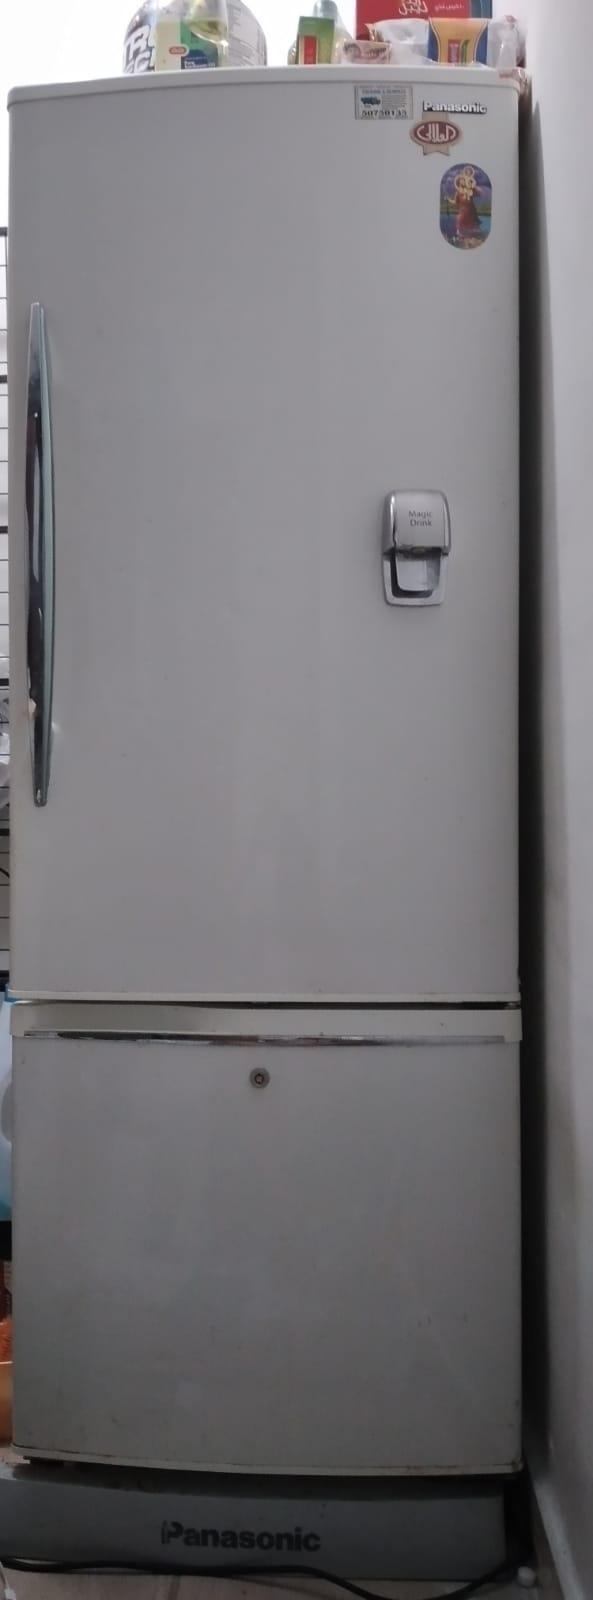 Home Appliance- Fridge for Sale